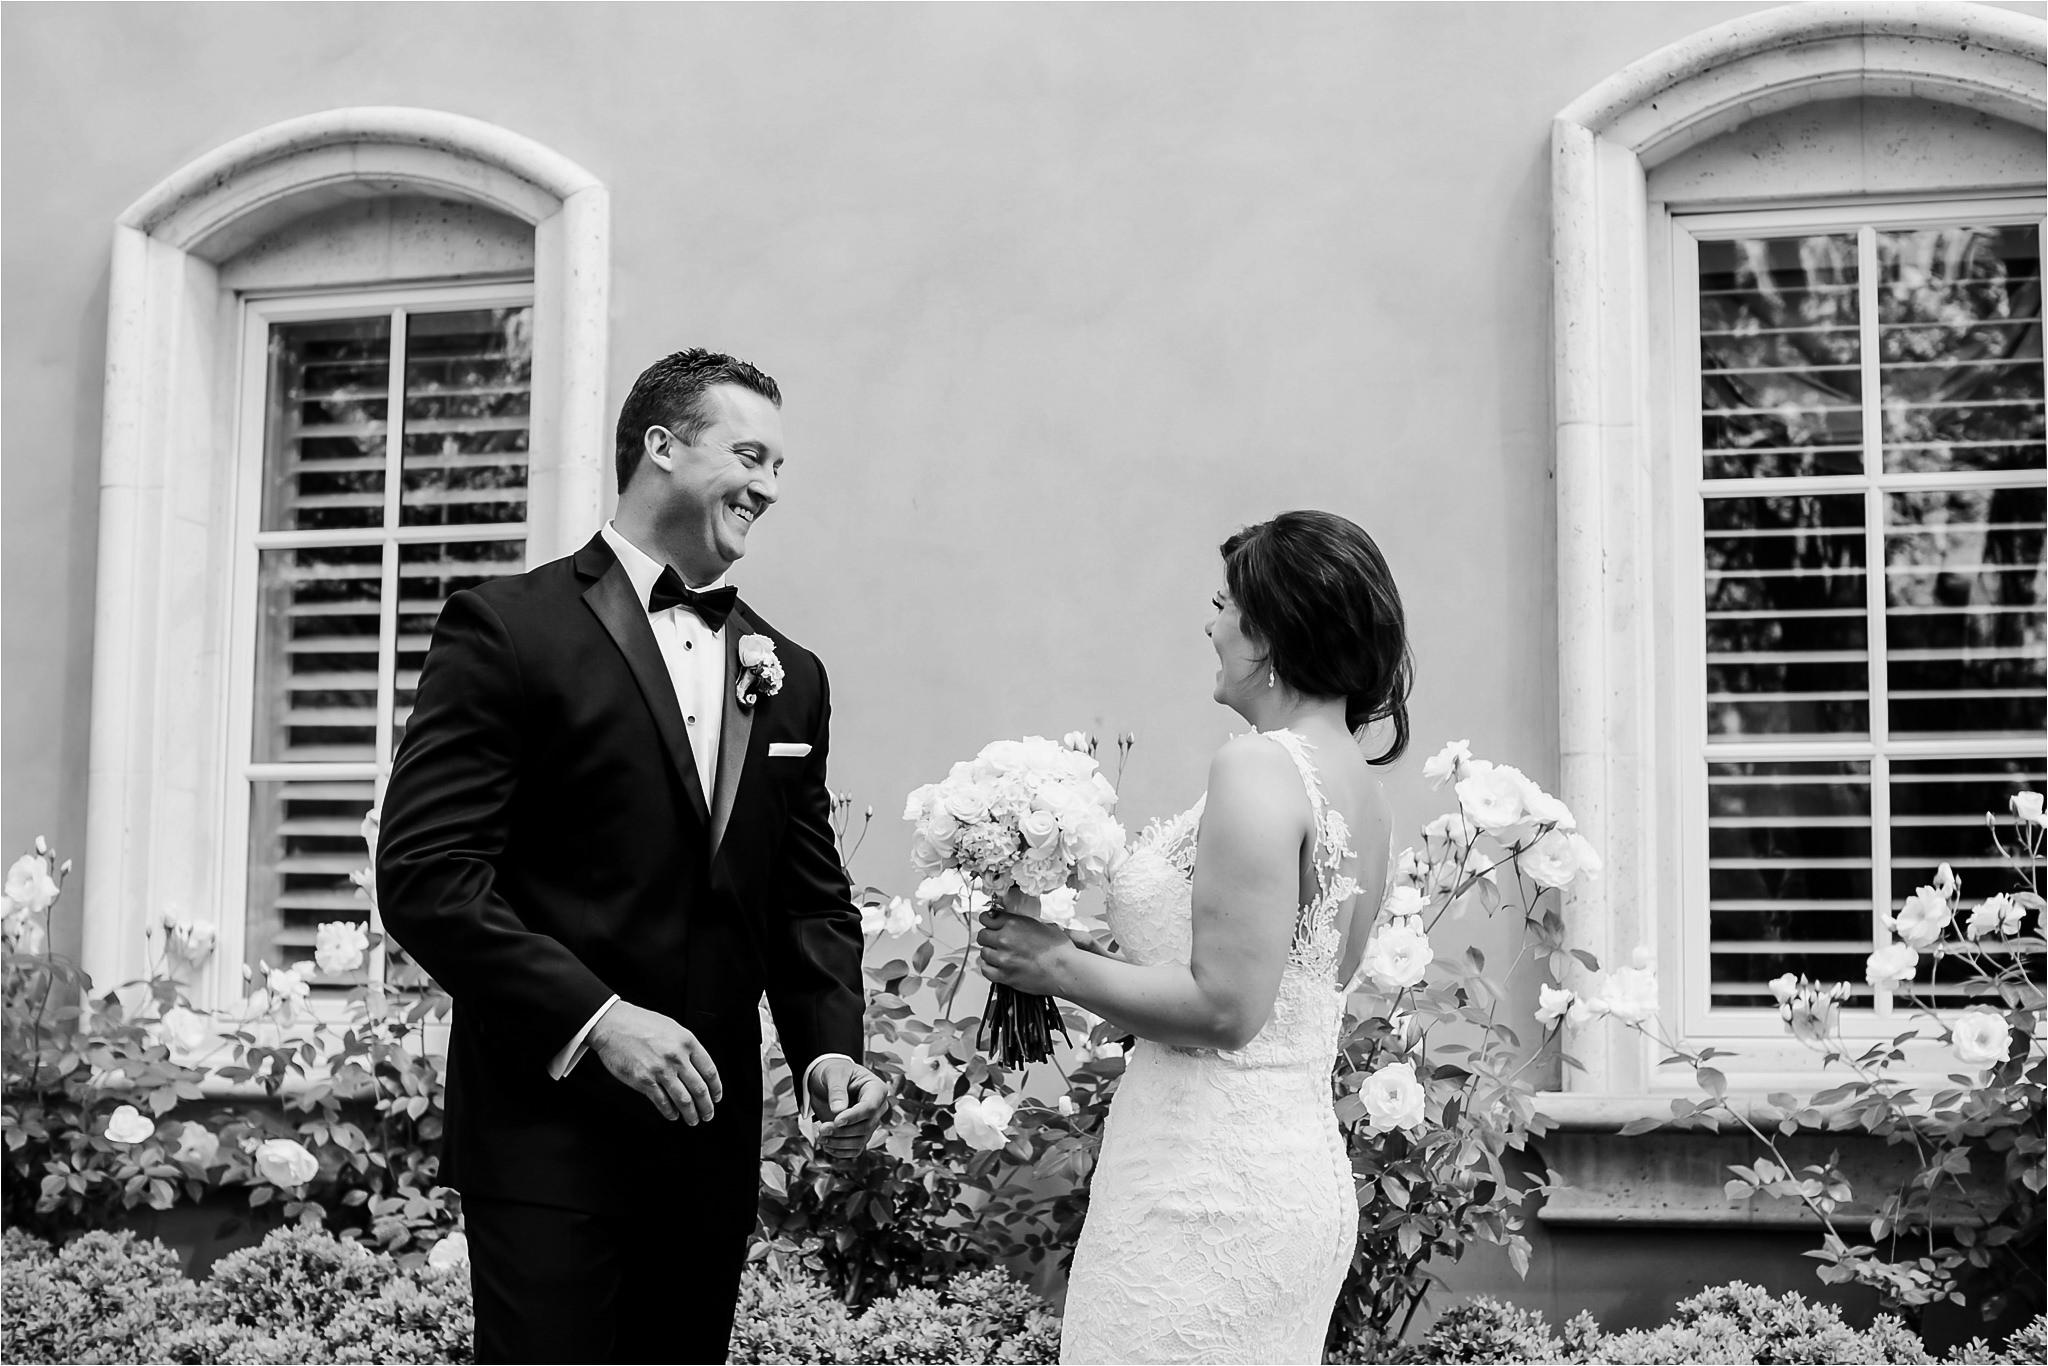 jessica-roman-photography-arden hills wedding photograpger-sacramento-boise-11.jpg